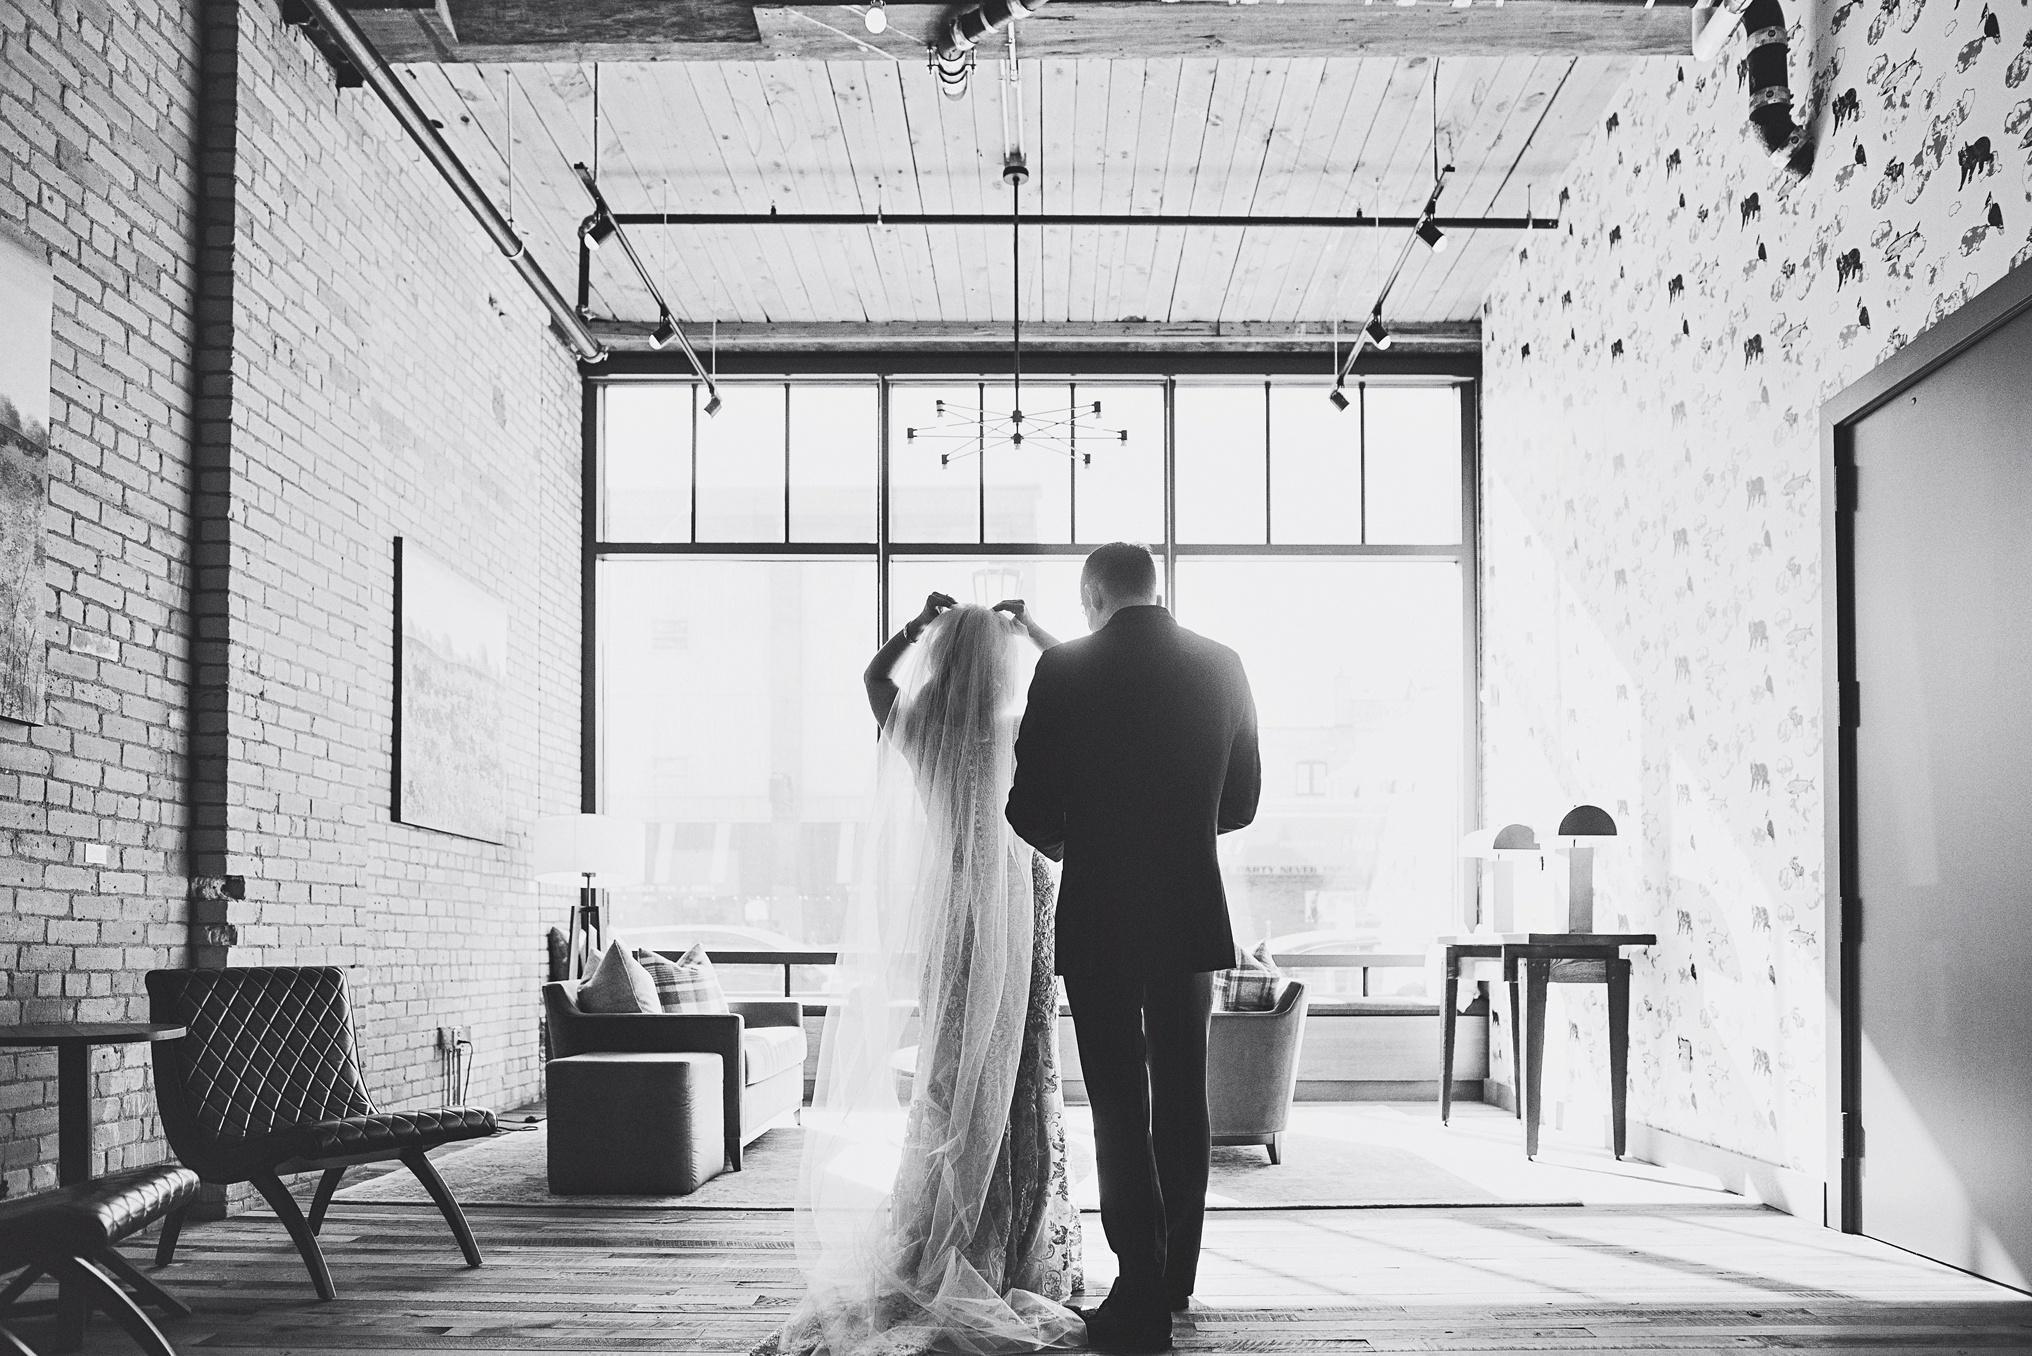 best_wedding_photography_2017_by_lucas_botz_photography_139.jpg